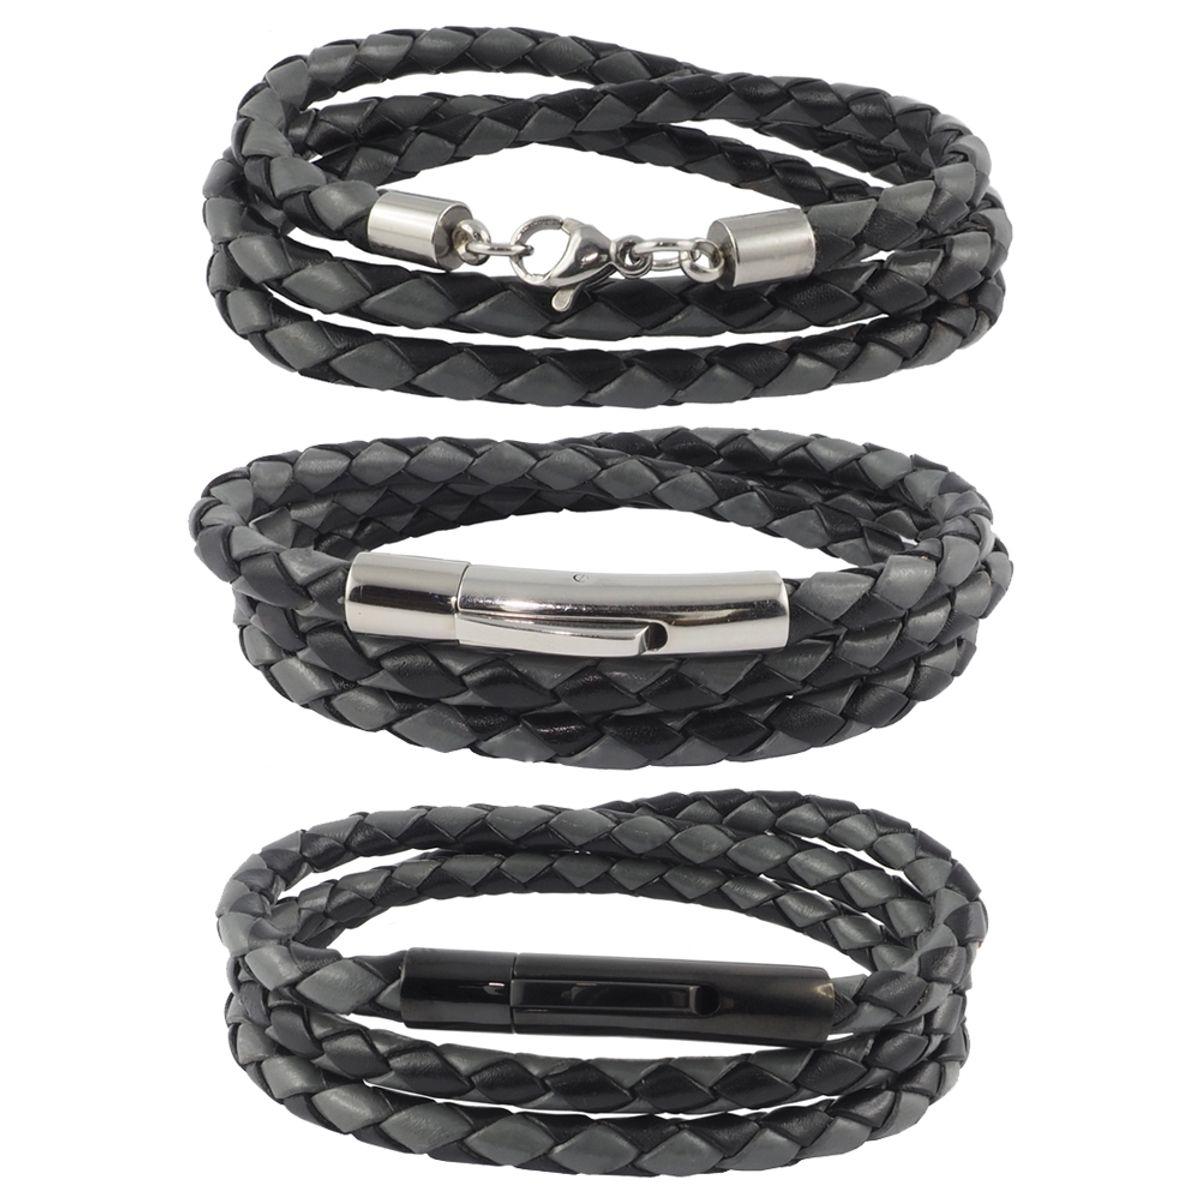 10 Stück Lederkette Halskette Lederband Kette Karabiner Verschlus Schwarz